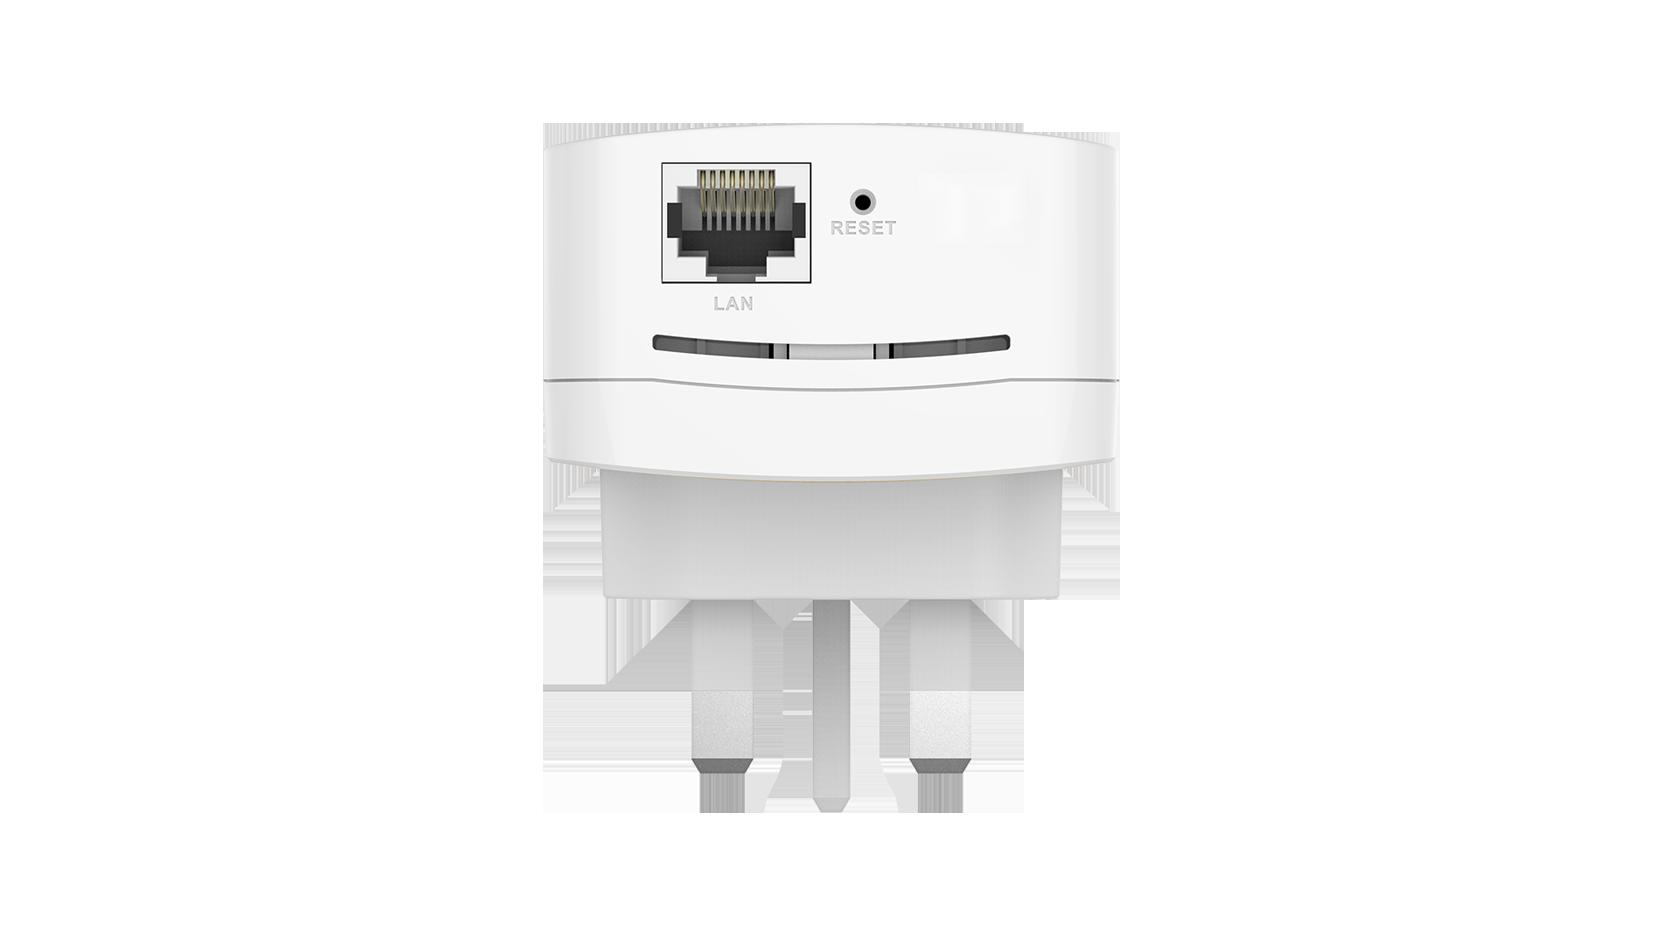 DAP-1330 N300 Wi Fi Range Extender | D-Link UK